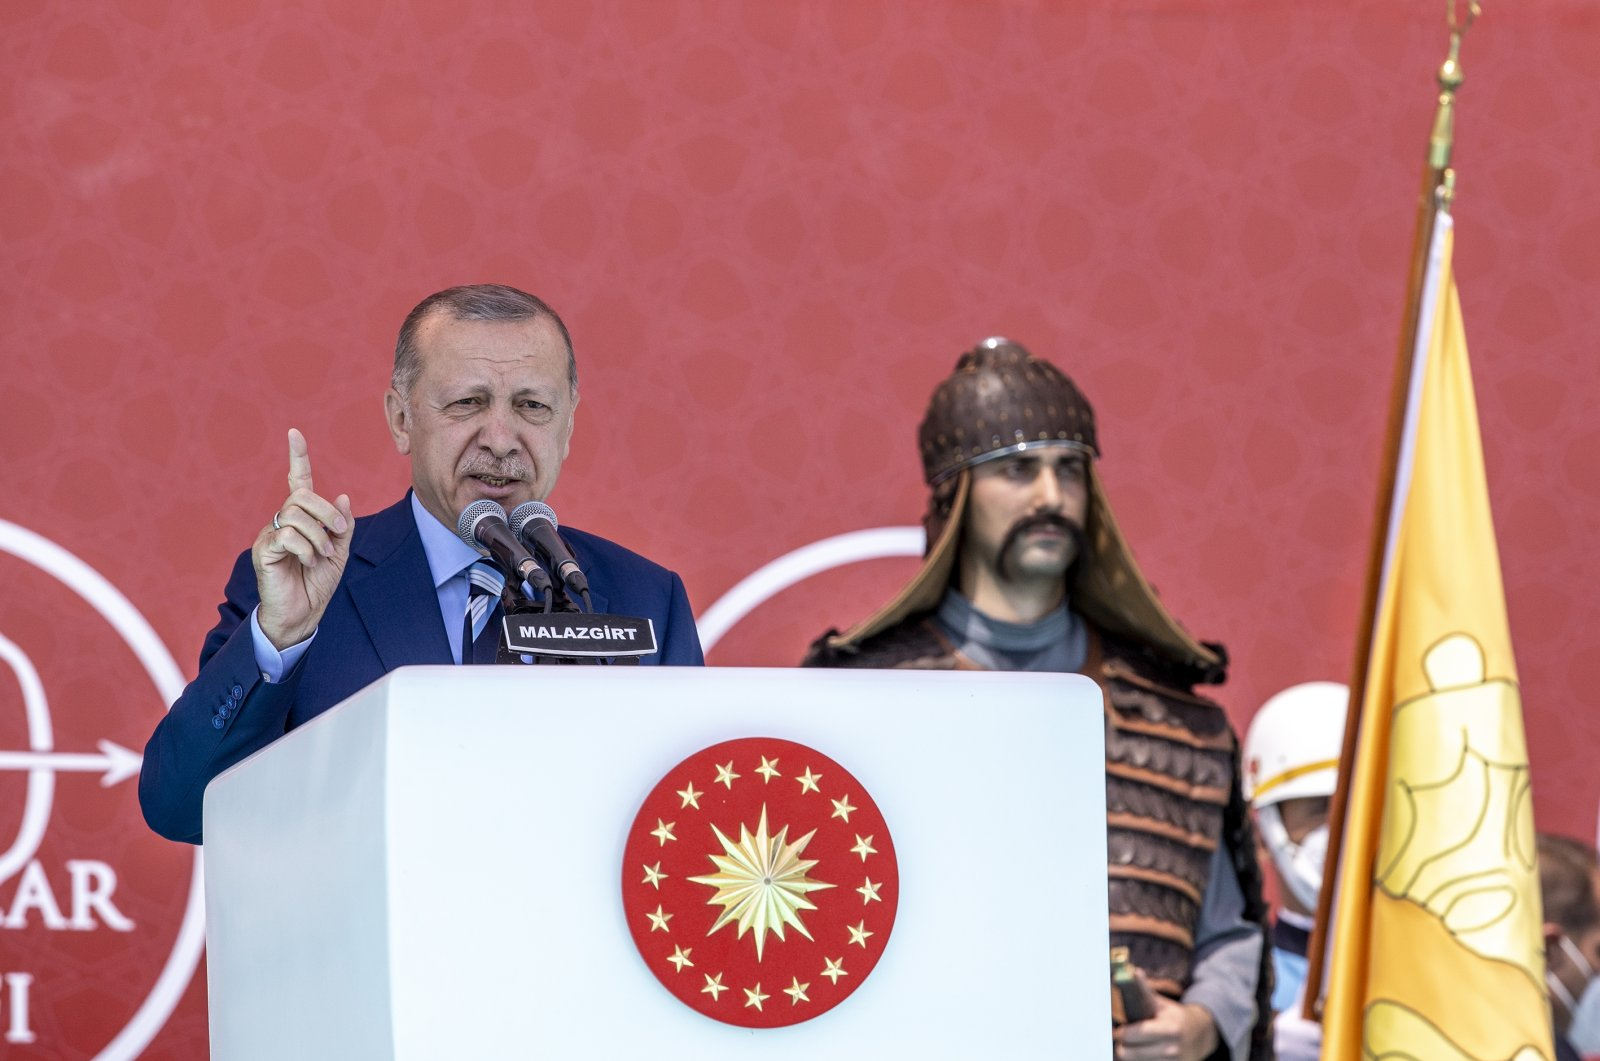 President Recep Tayyip Erdoğan speaks at the event, in Malazgirt, Muş, eastern Turkey, Aug. 26, 2021. (AA PHOTO)